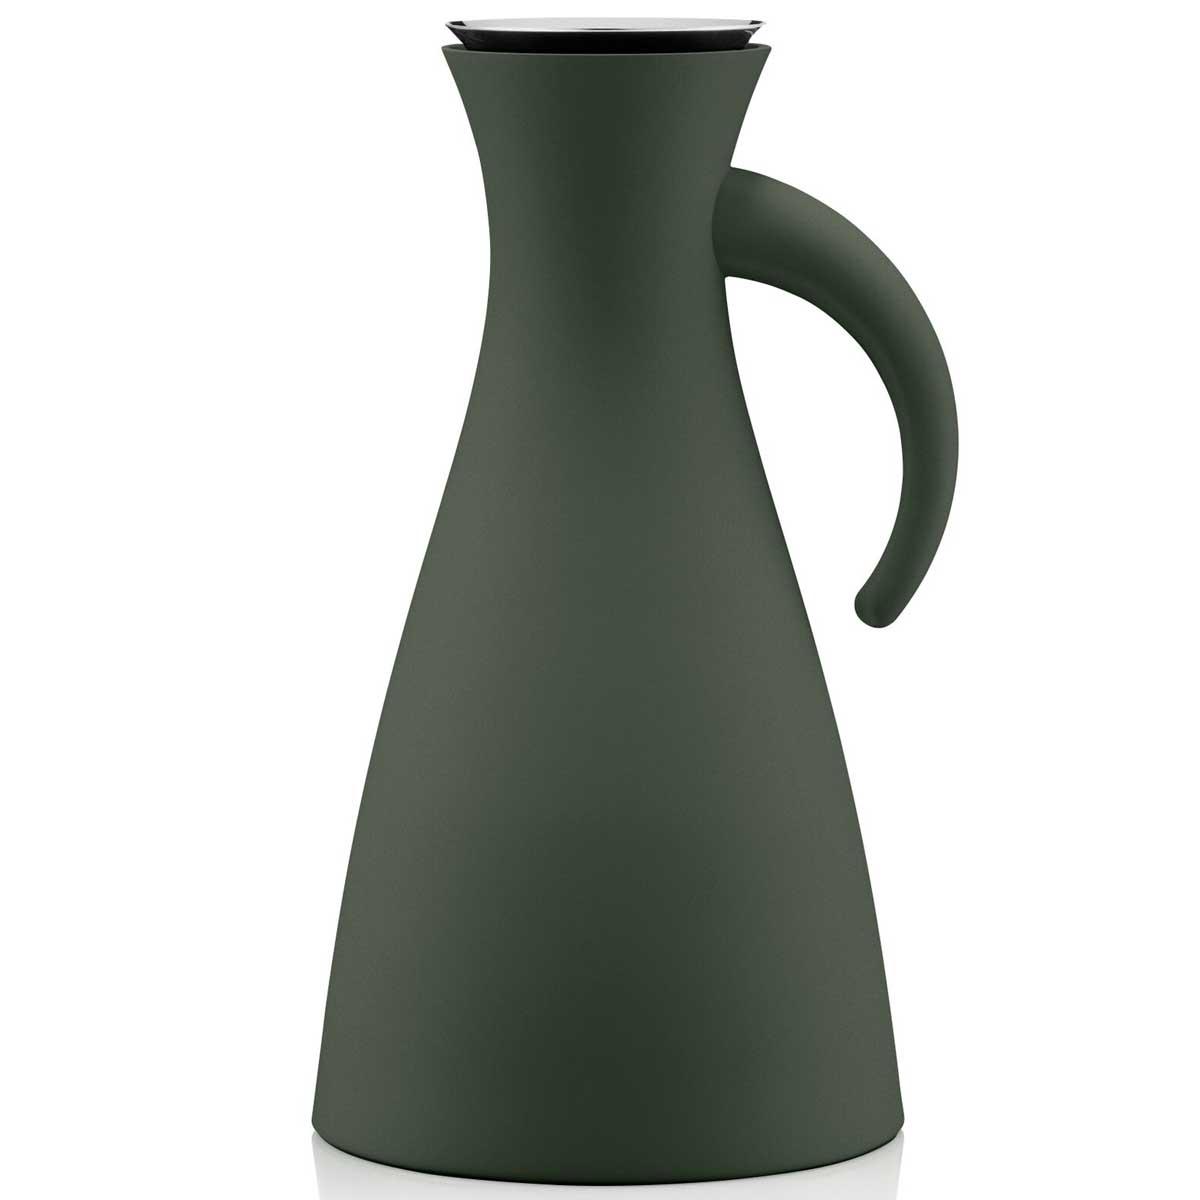 eva solo isolierkanne forrest green dunkelgr n 1 0 liter thermoskanne speisen servieren. Black Bedroom Furniture Sets. Home Design Ideas